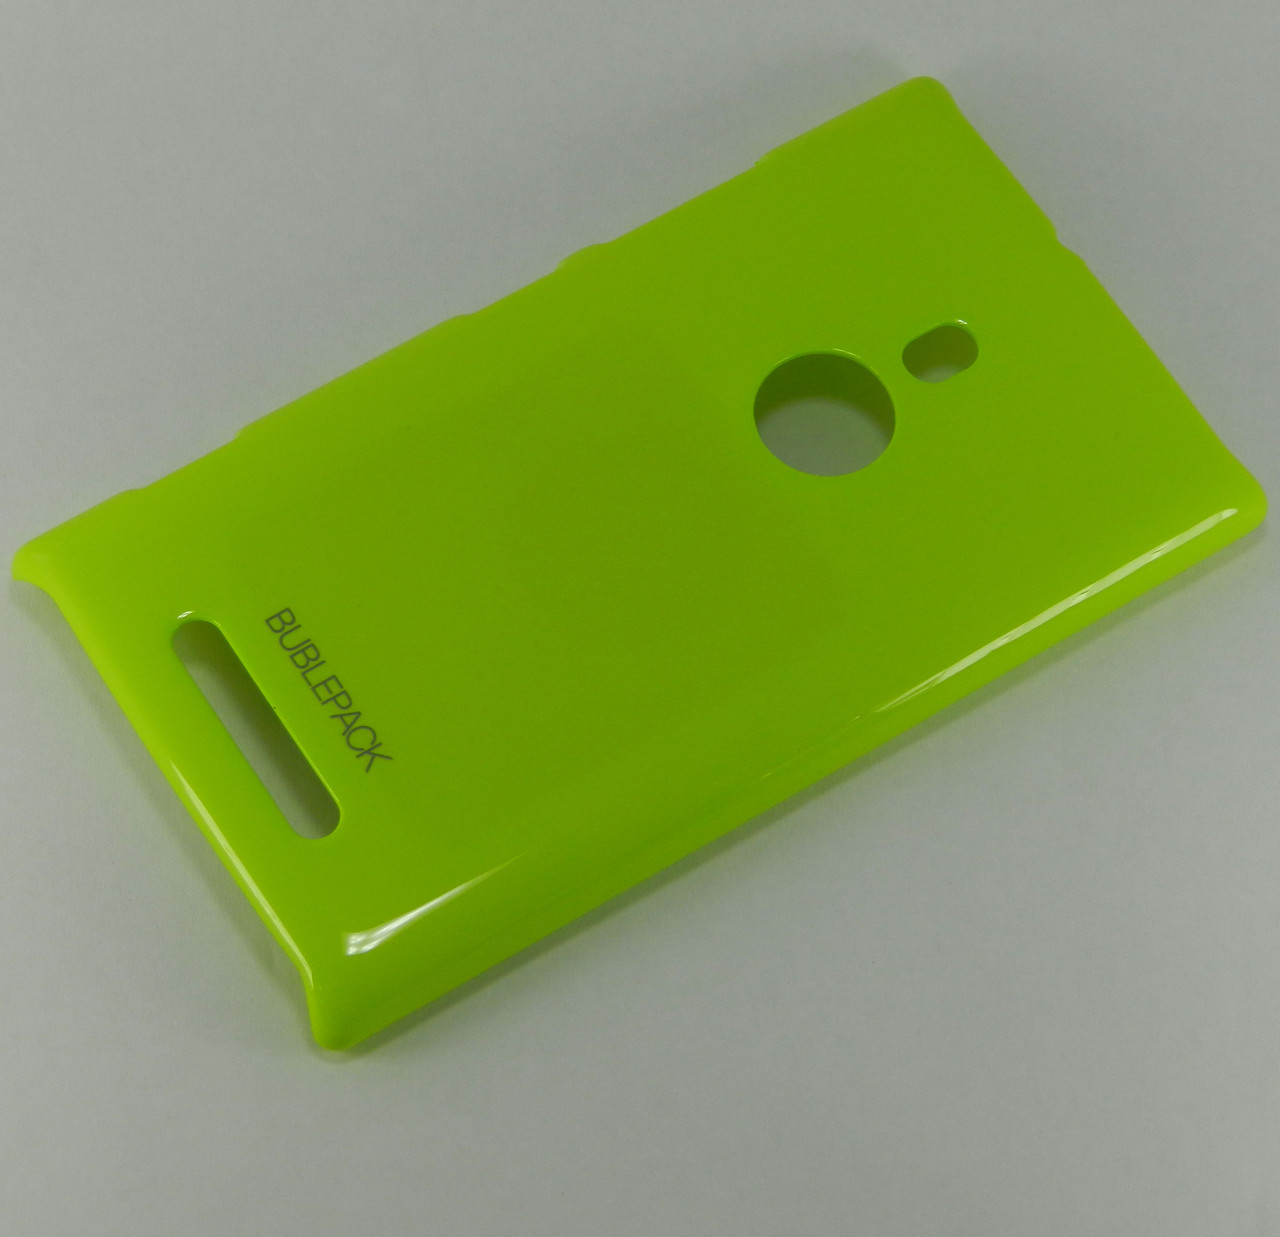 Чехол пластиковый на Nokia Lumia 925 Bubble Pack Лайм